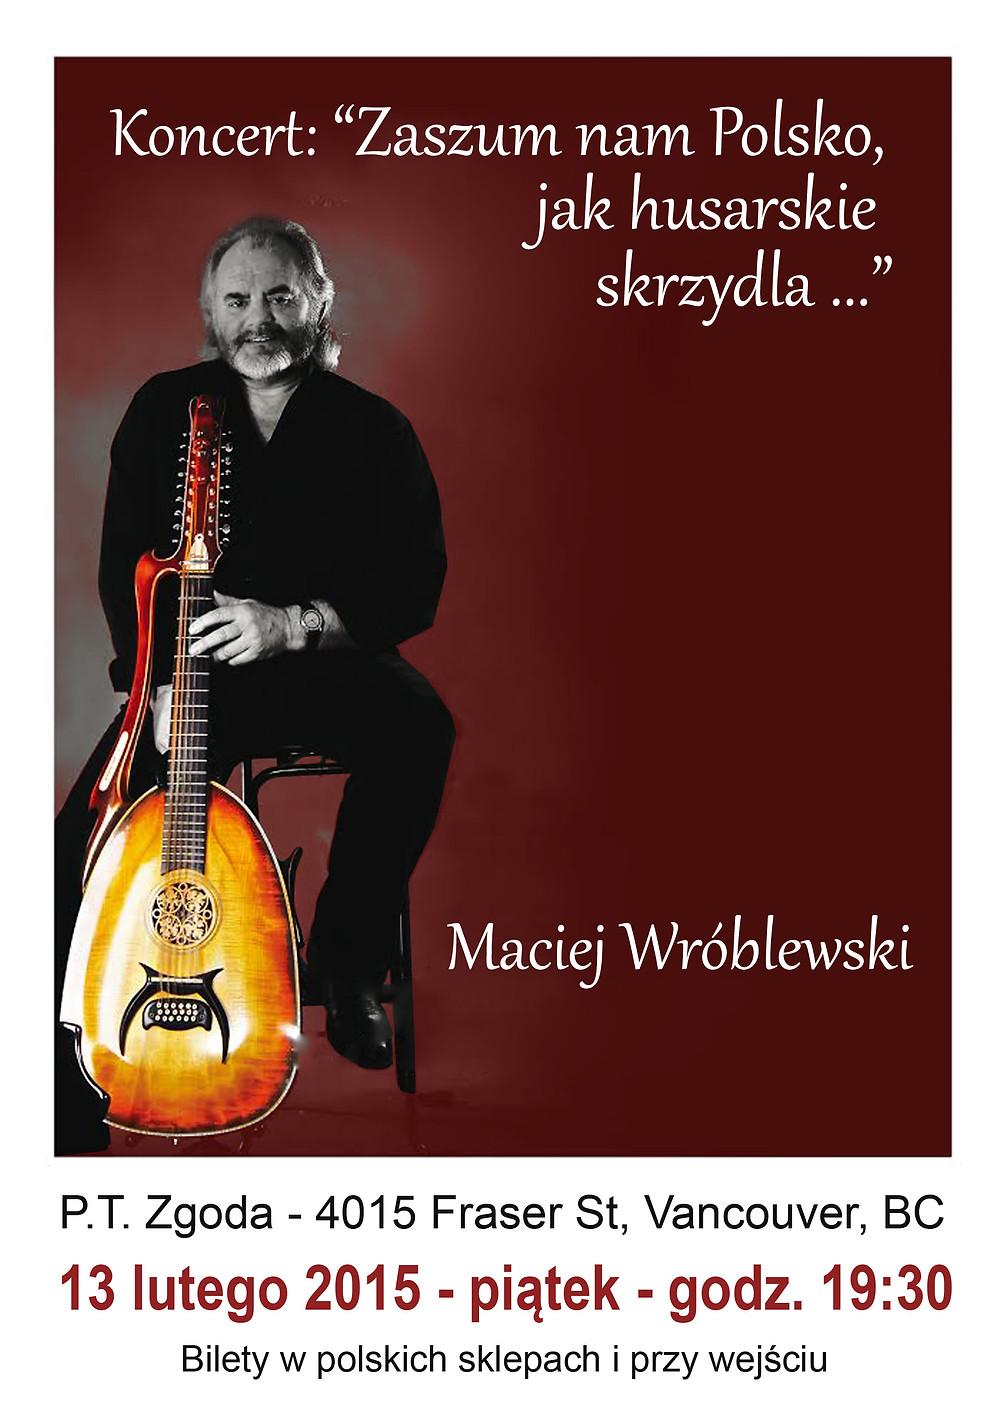 koncert-mw1.jpg